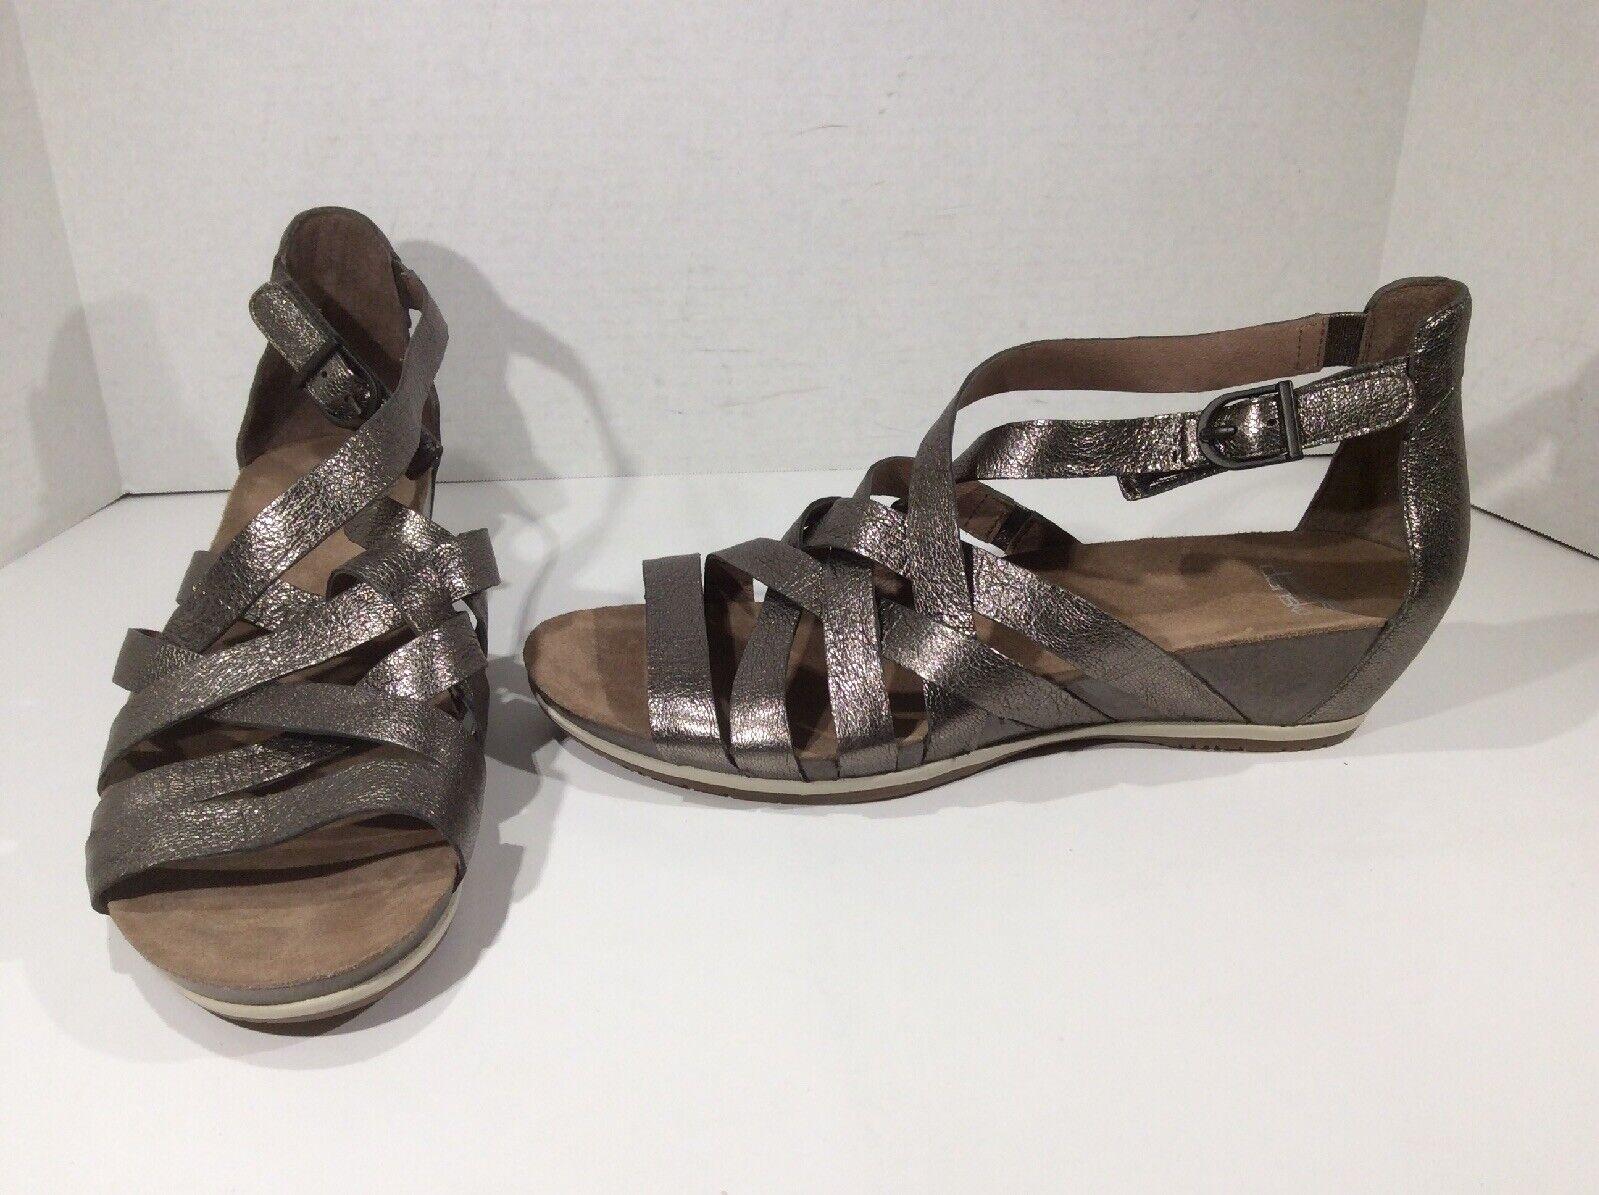 DANSKO donna Vivian Bronze Gladiator Sandals scarpe Sz 41 41 41 = 10.5 - 11 DK-174 c15686